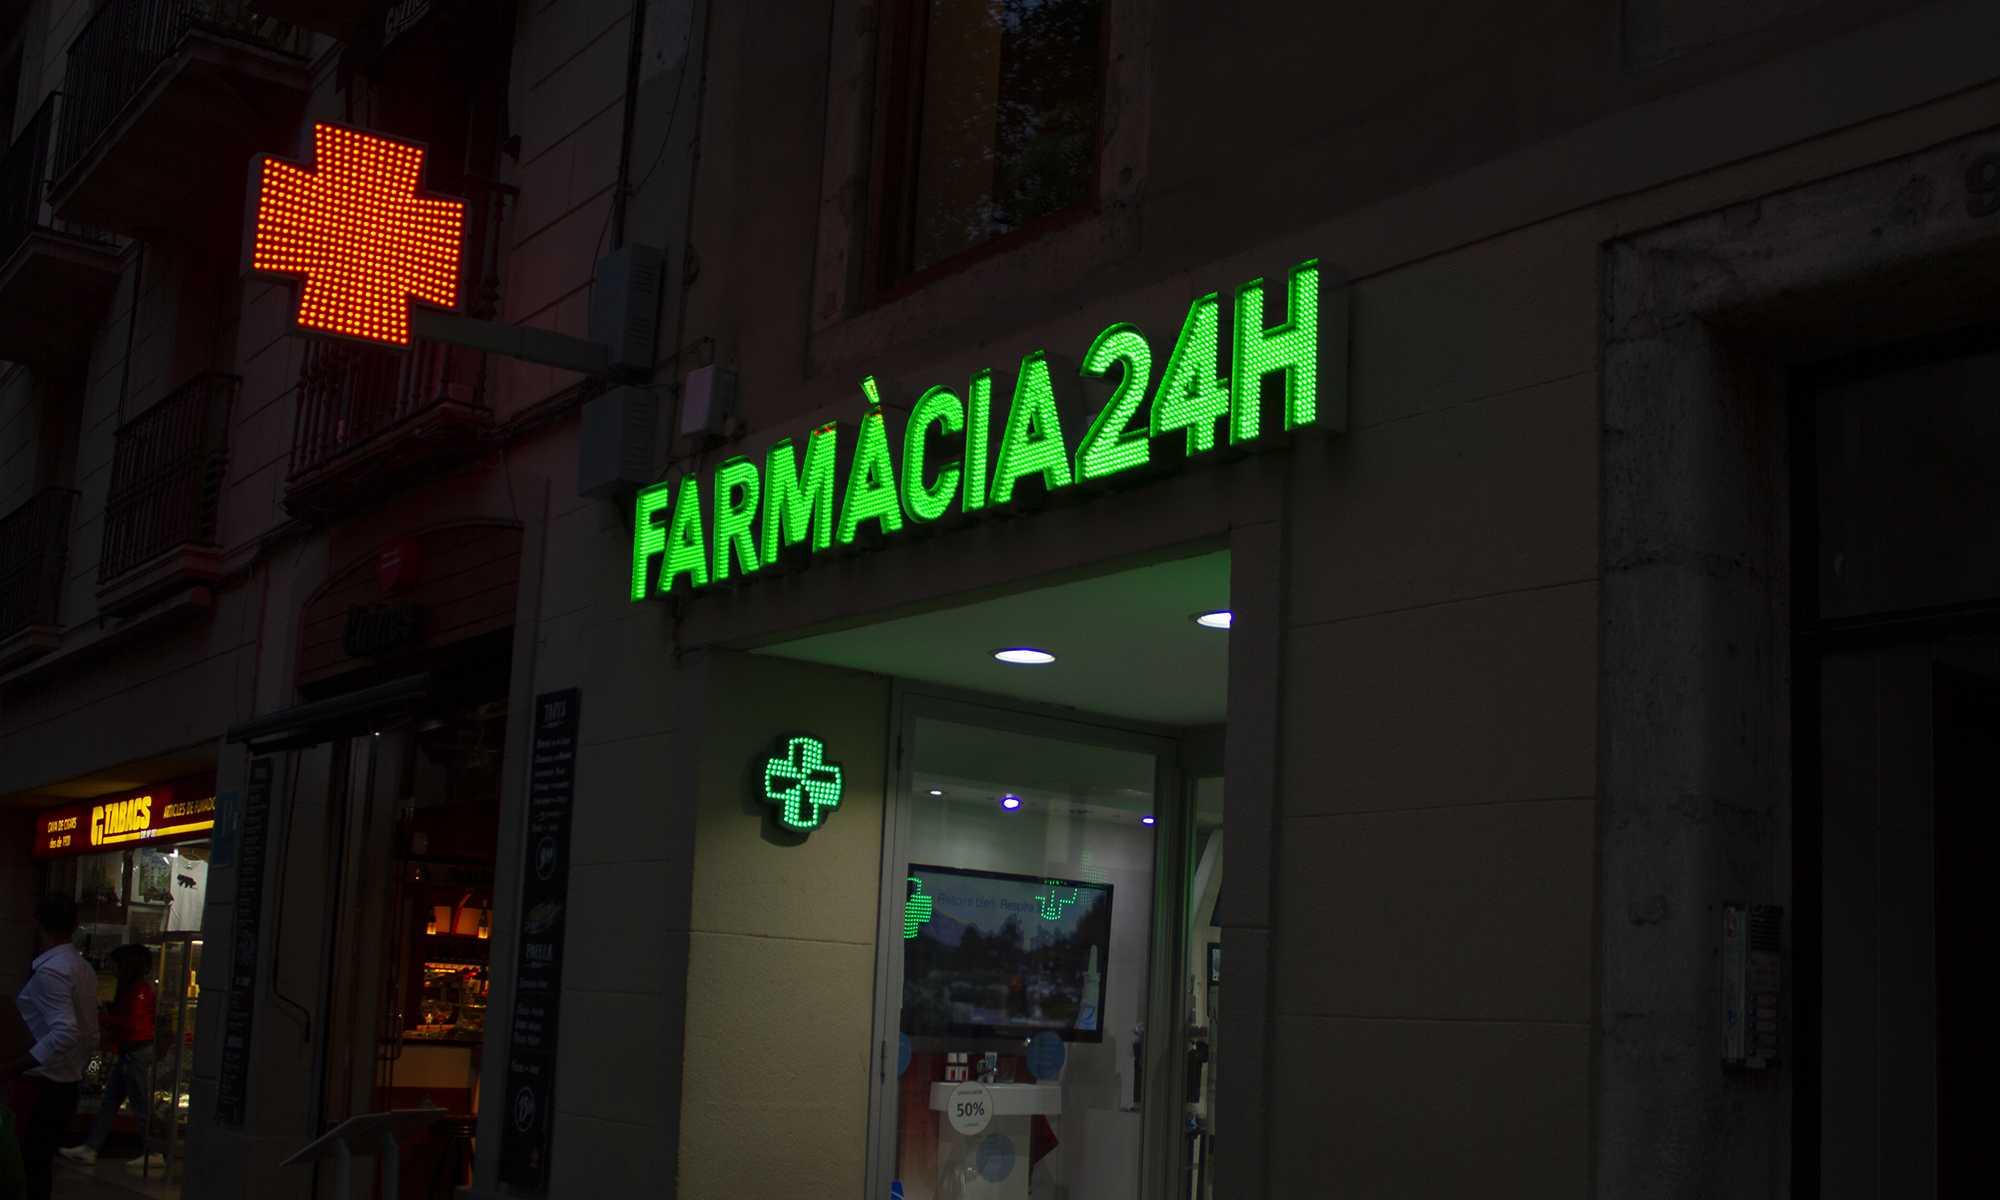 Farmacia Clapes 24h en la Rambla de Barcelona